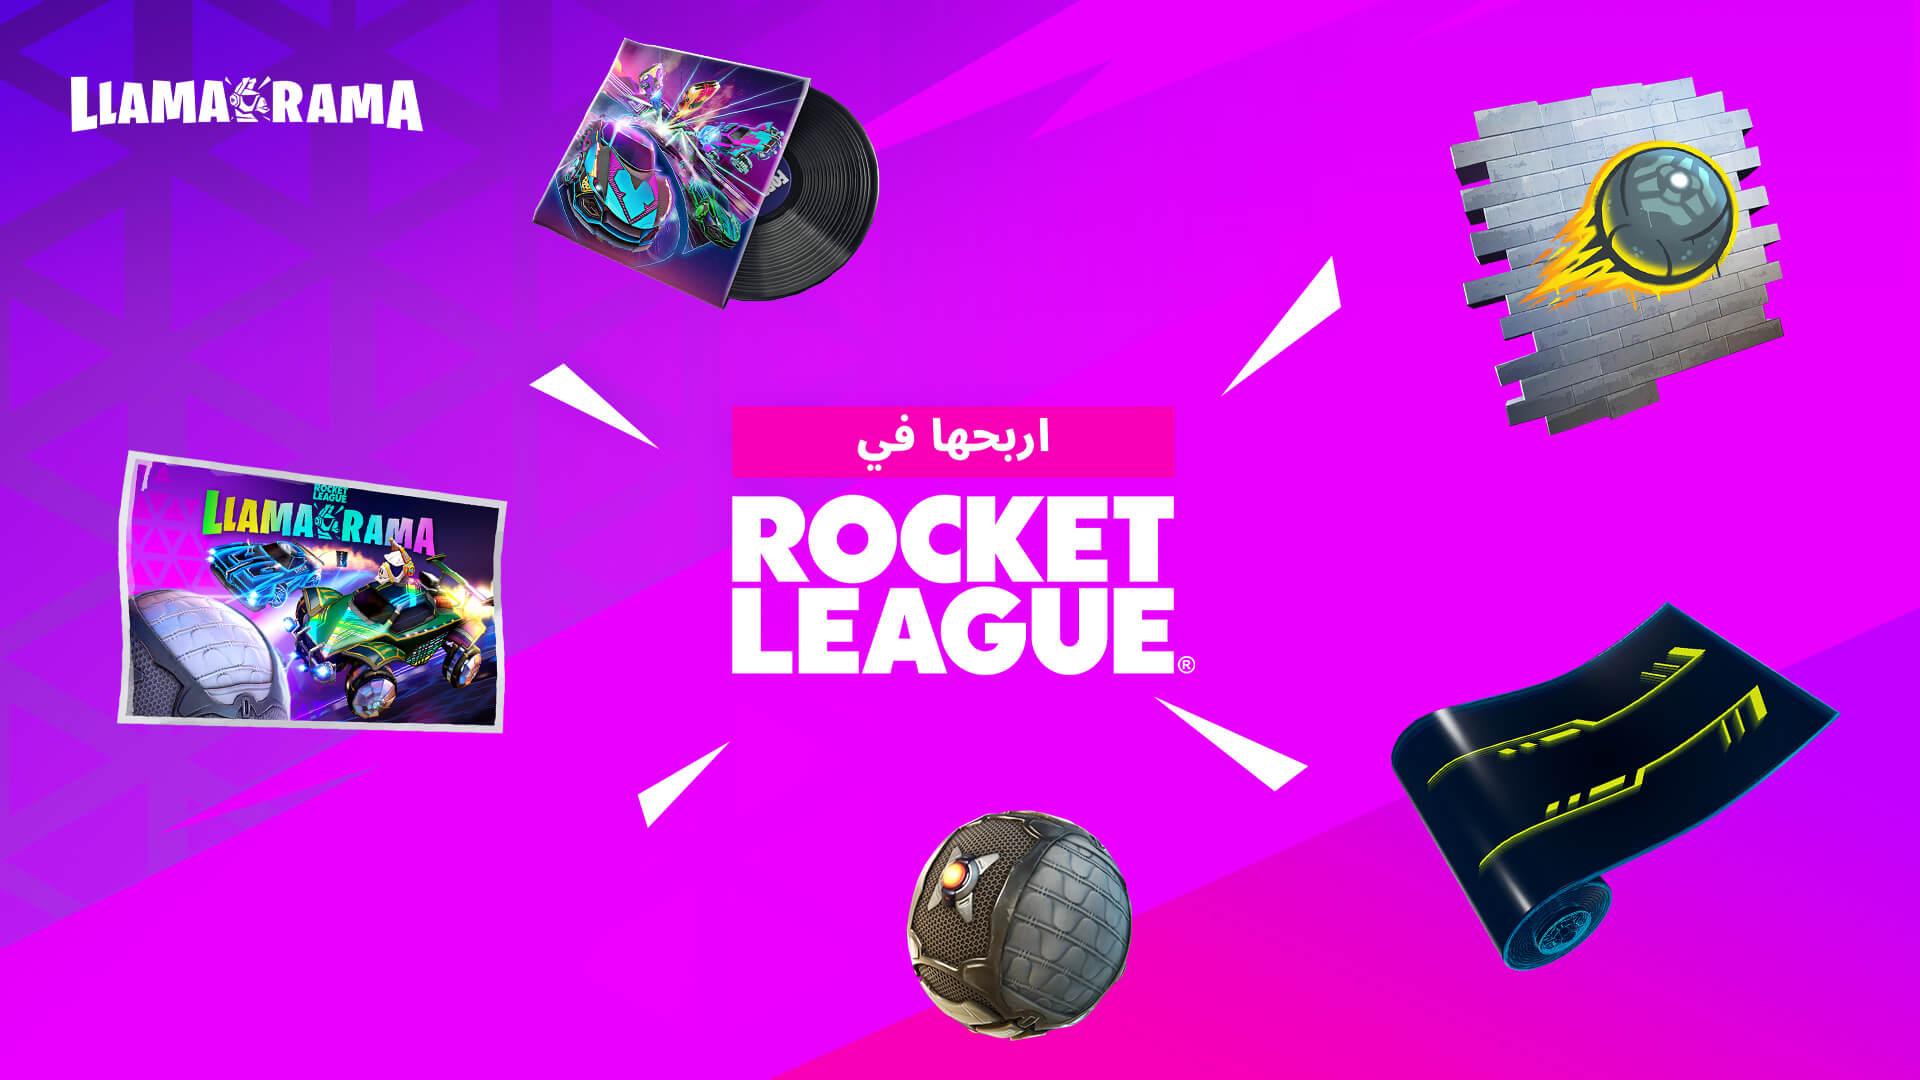 AR 16BR RocketLeague Llama Rama Rewards V2 Social